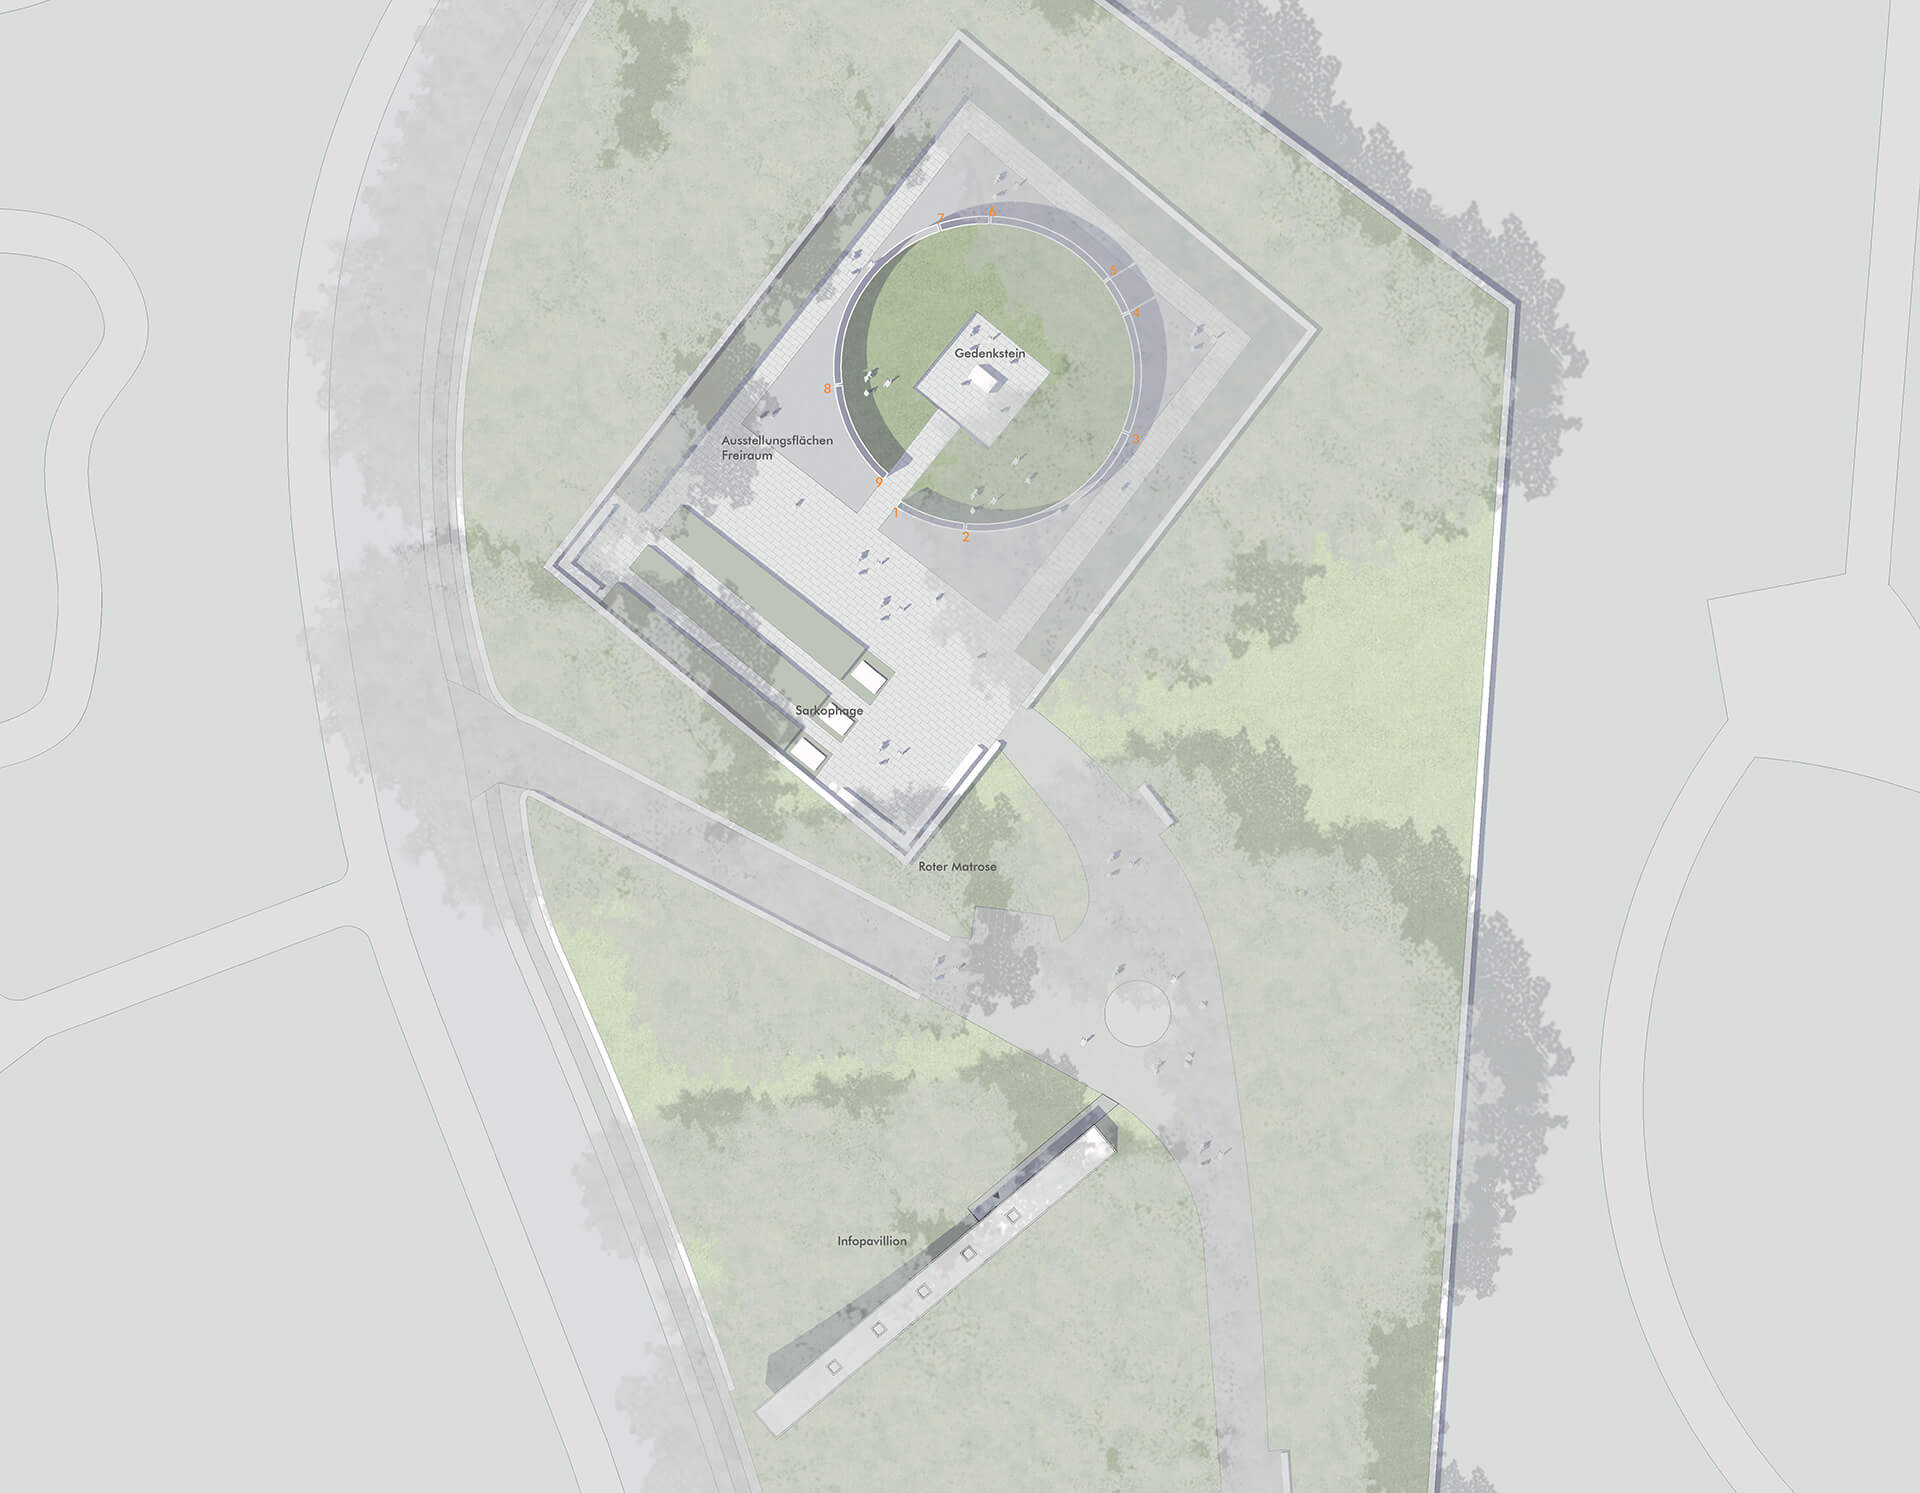 100-55-Maerzgefallene-Layout-A1-verlängert-schmaler.indd